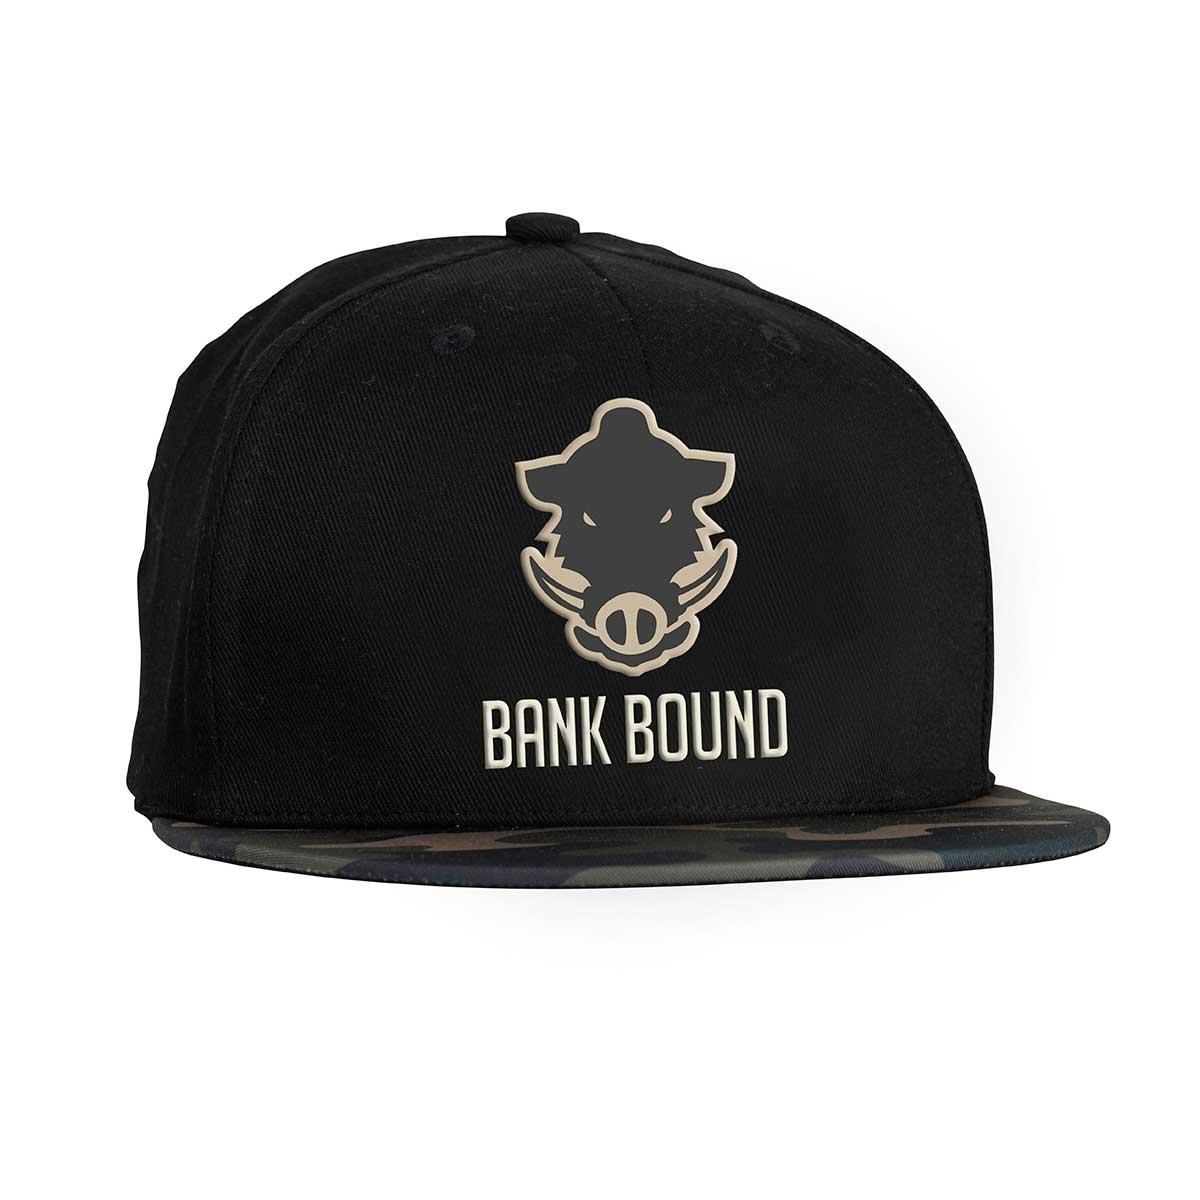 Prologic bank bound flat bill cap black camo glasgow for Fishing flat bill hats